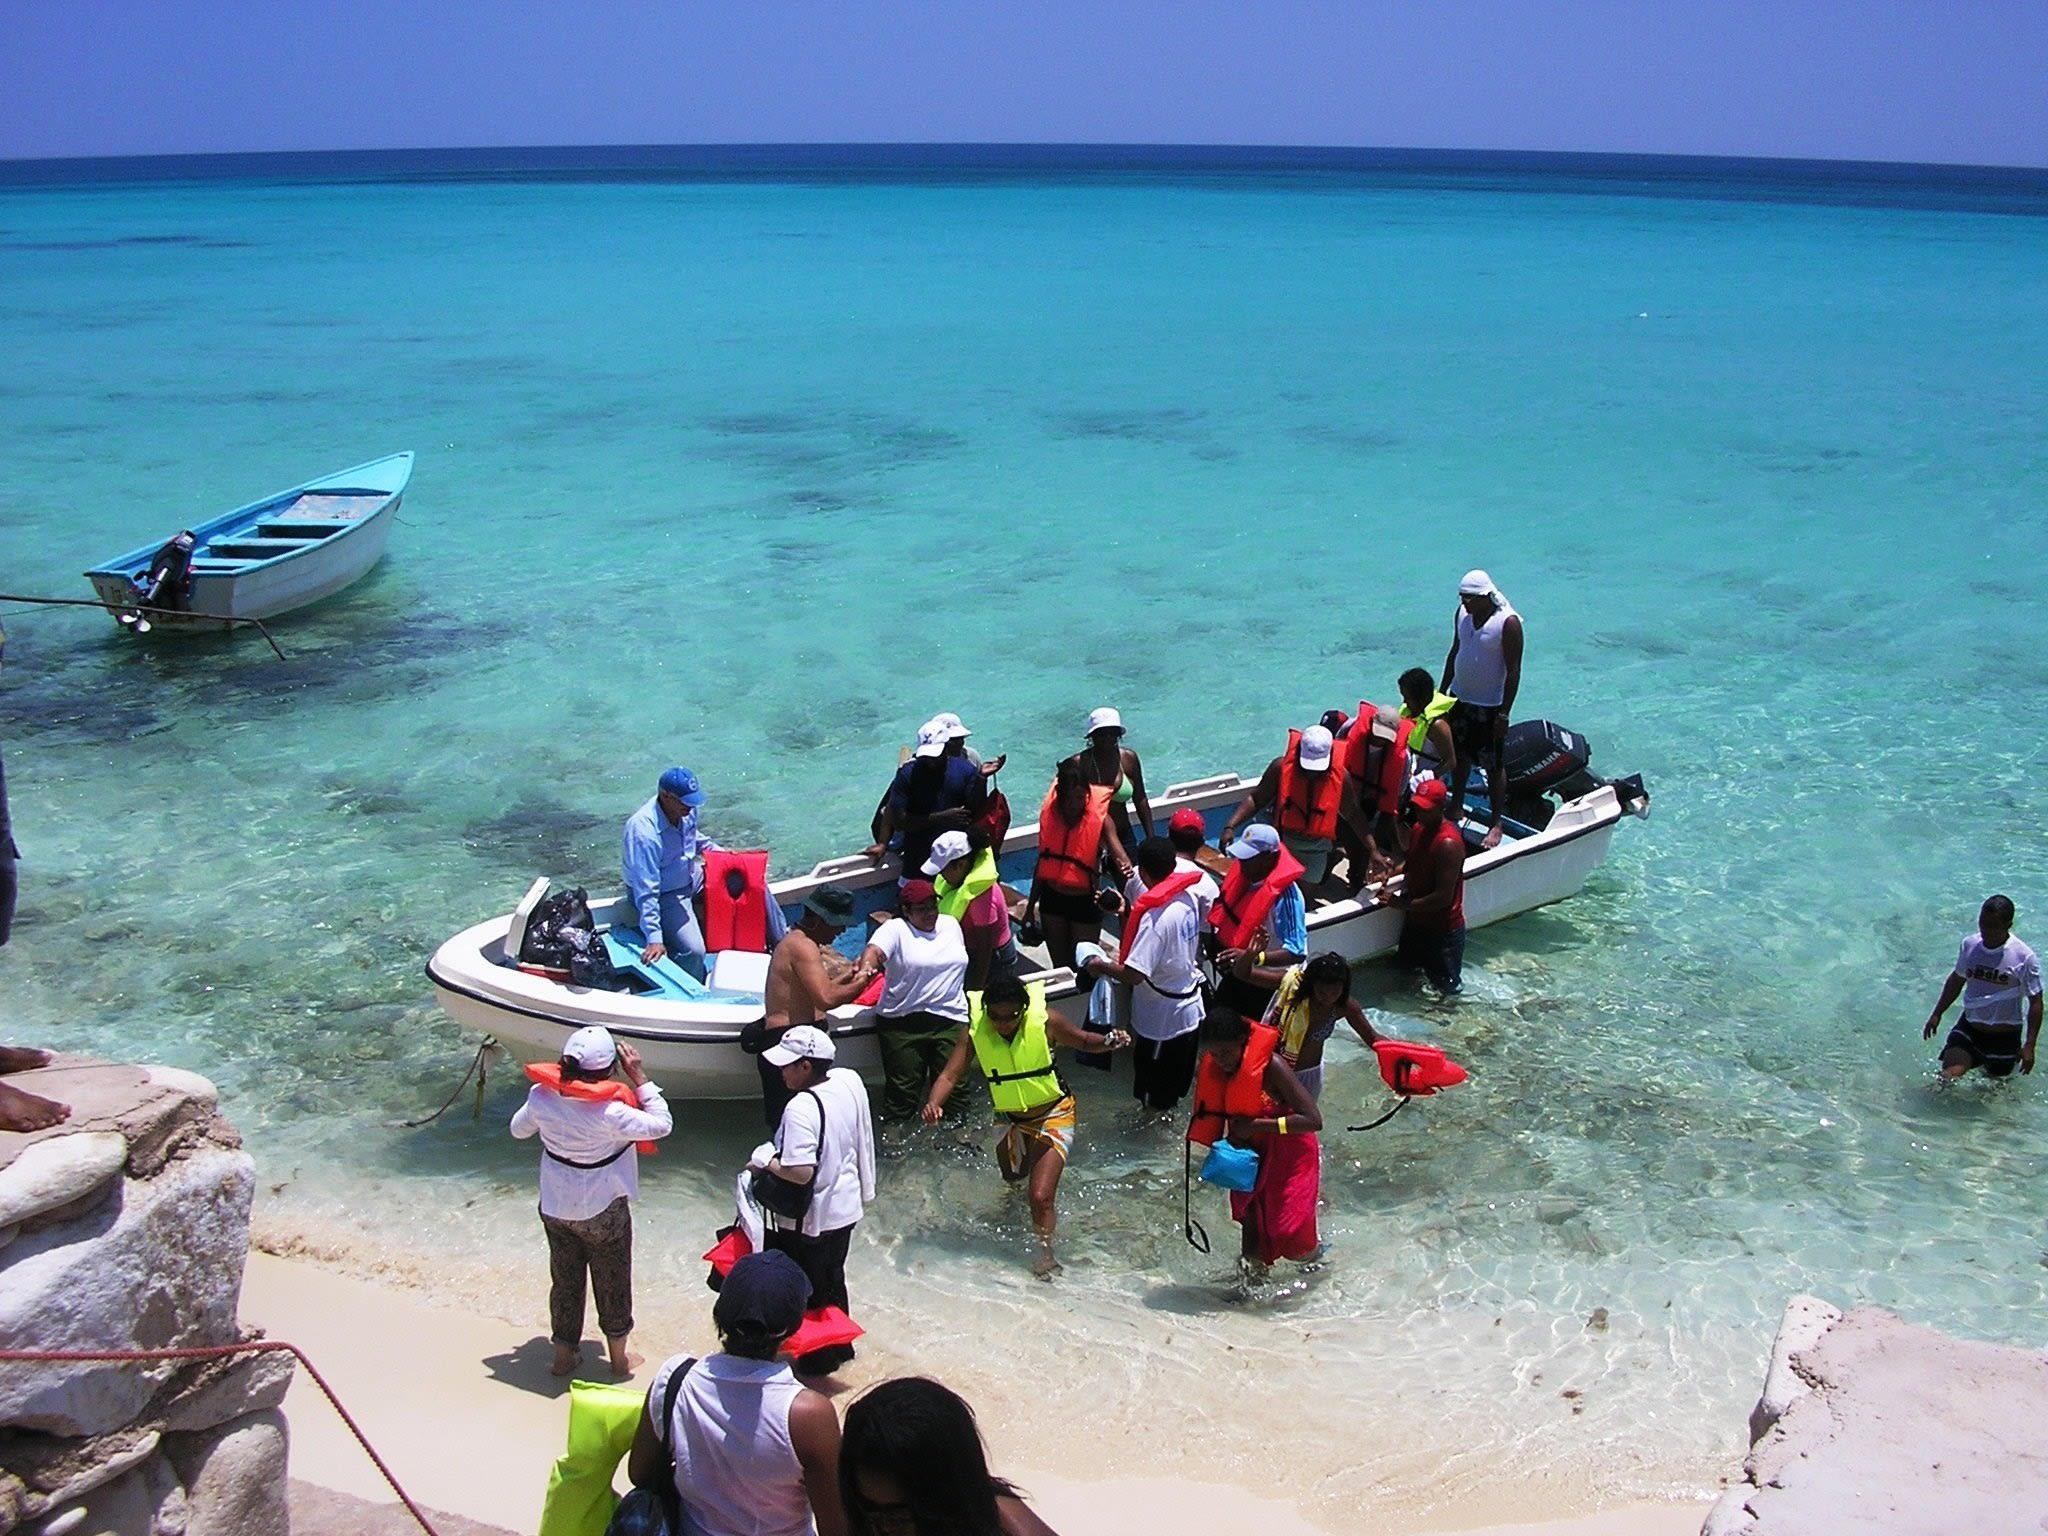 Boat ride to the Saona island